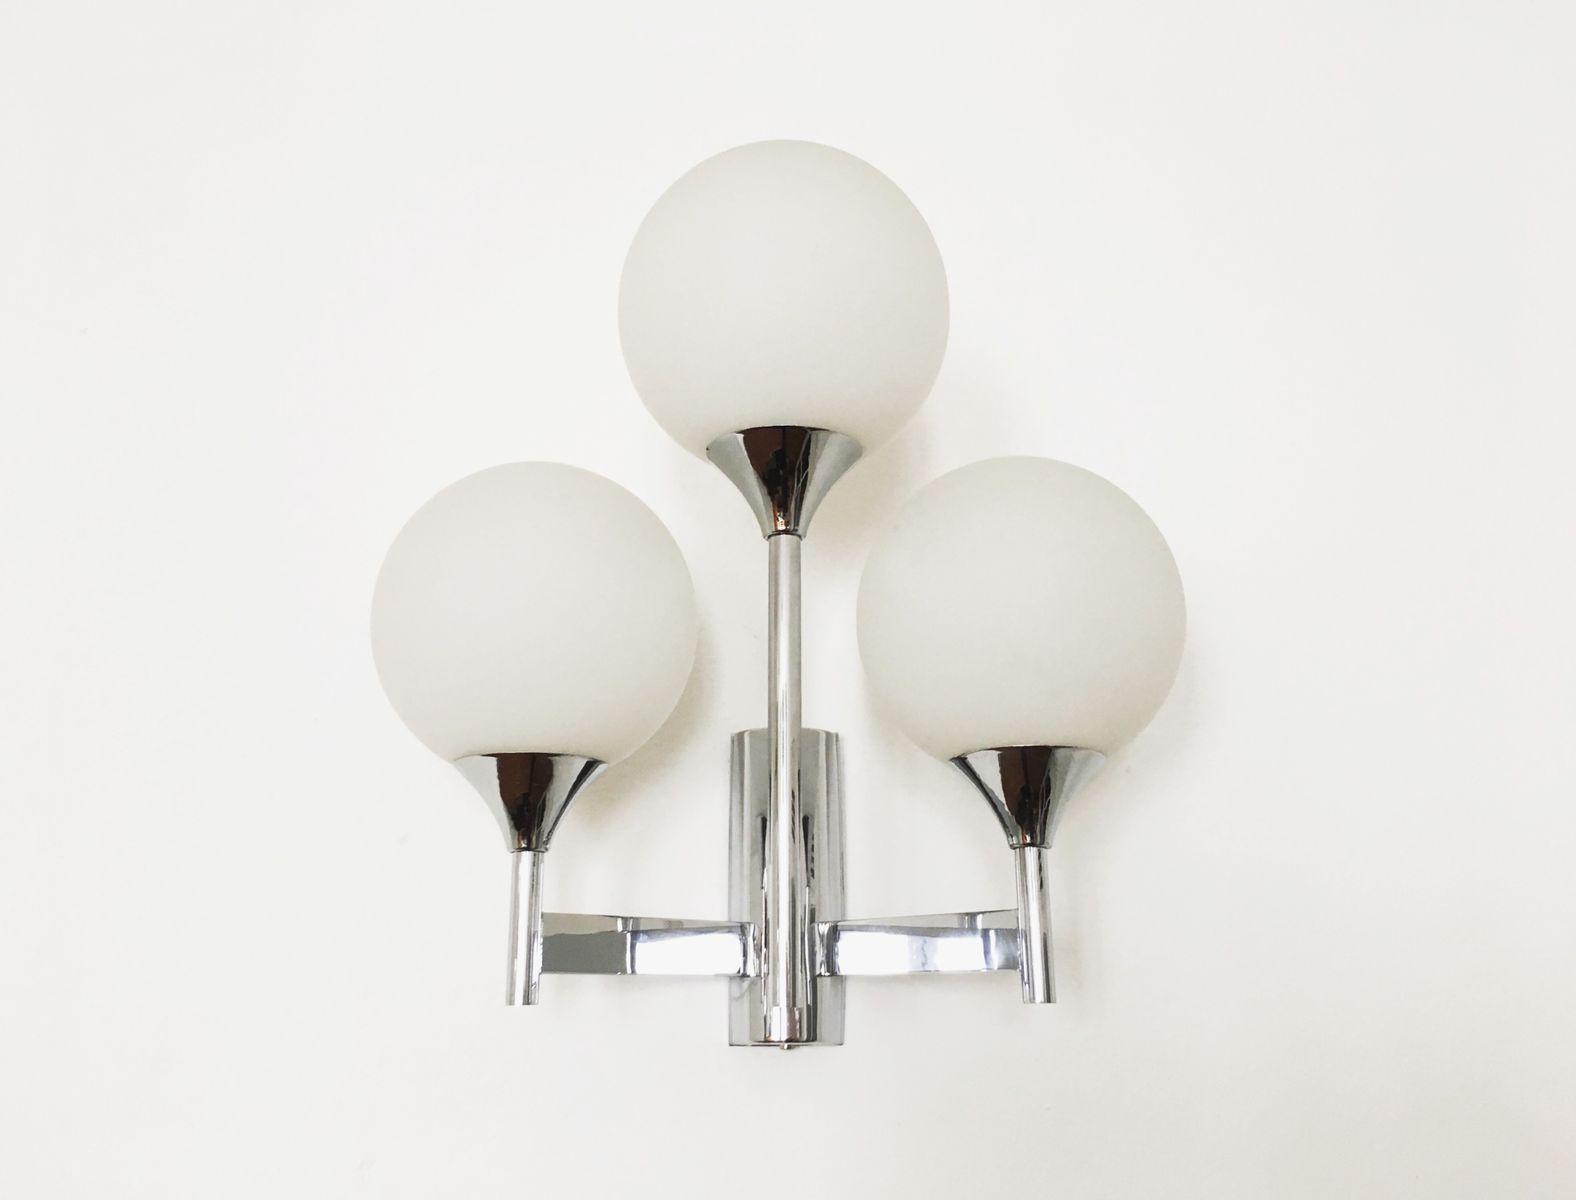 Led Wandbeleuchtung Led Spiegelleuchte Wandleuchte Chrom Design Badlampe Badleuchte On Off Schalter Wandleuchte Bad I Wandlampe Wandbeleuchtung Wandleuchte